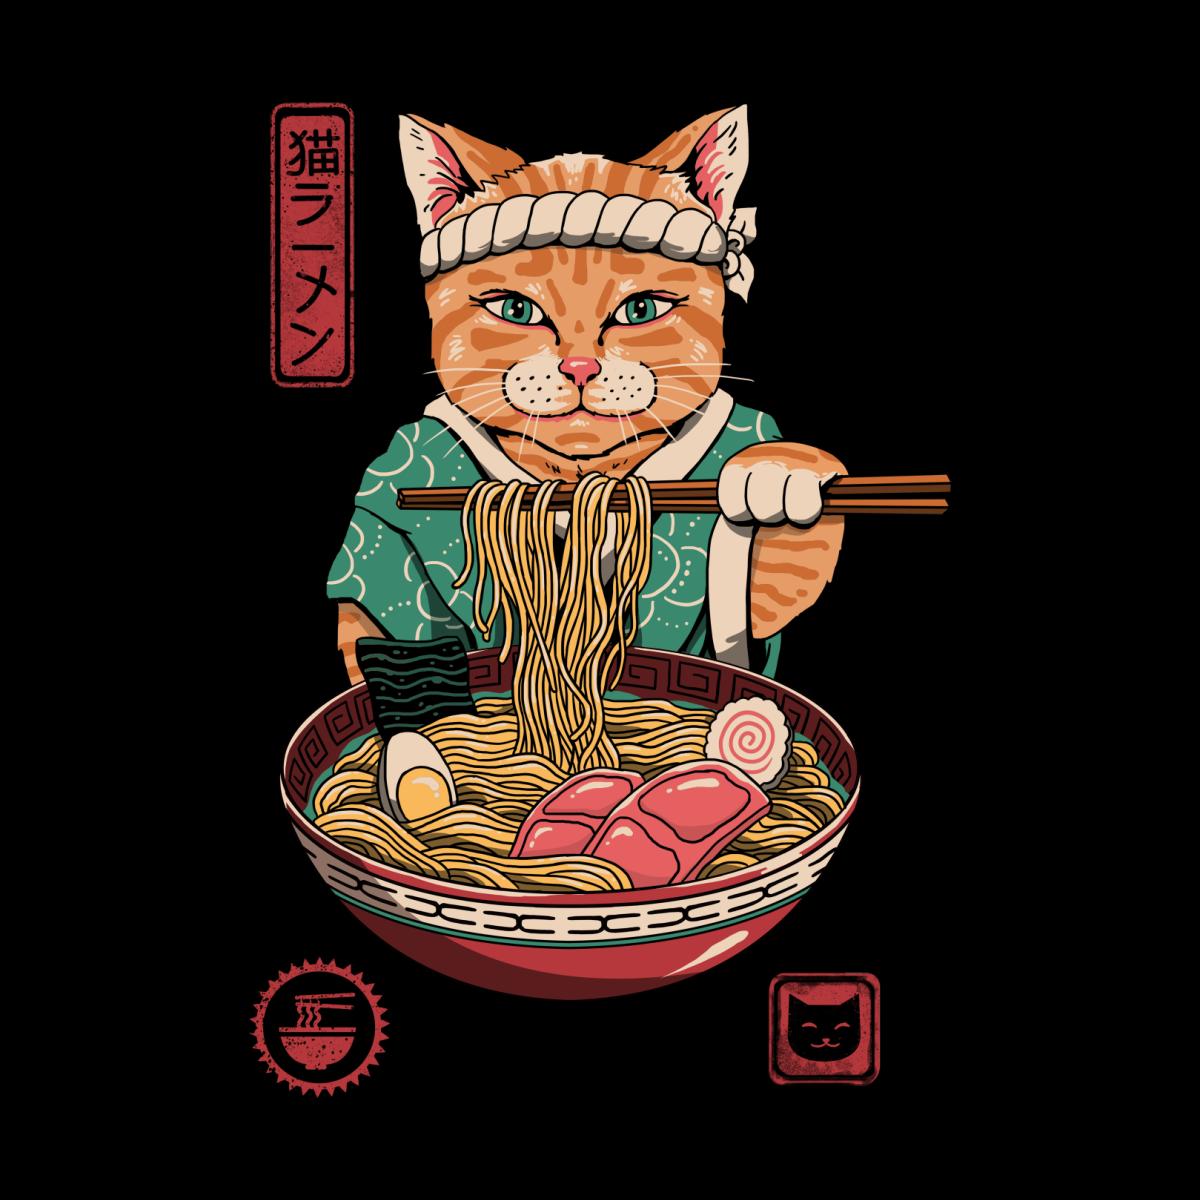 Neko Ramen Vincent Trinidad Art in 2020 Japanese pop